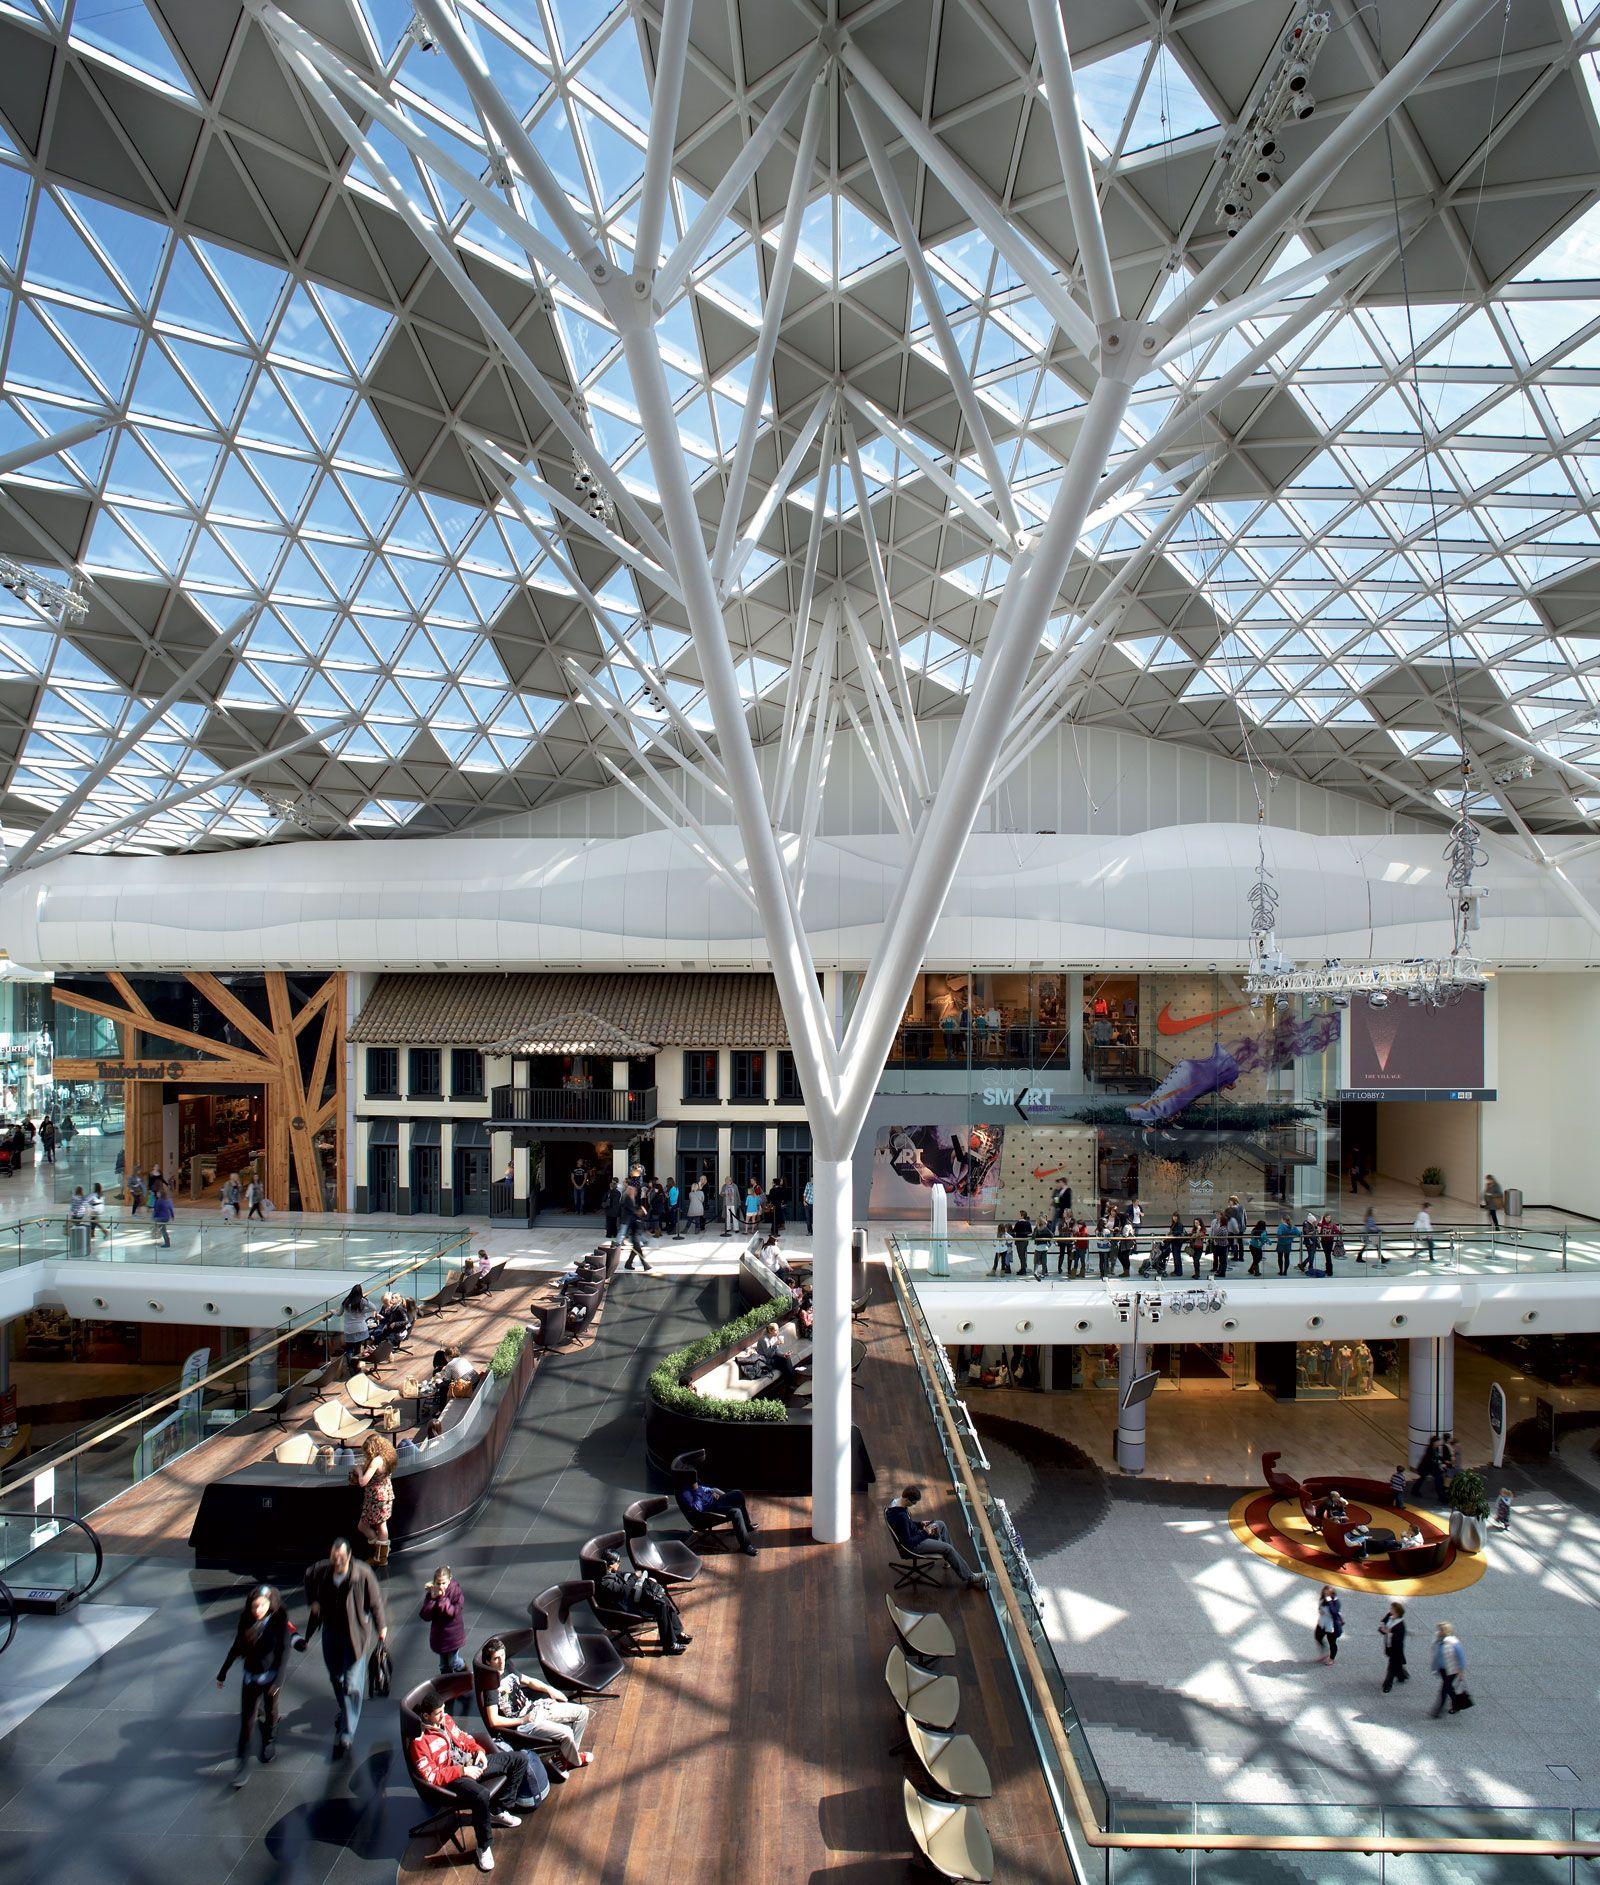 Best Westfield London Benoy Architecture Roof Architecture 400 x 300